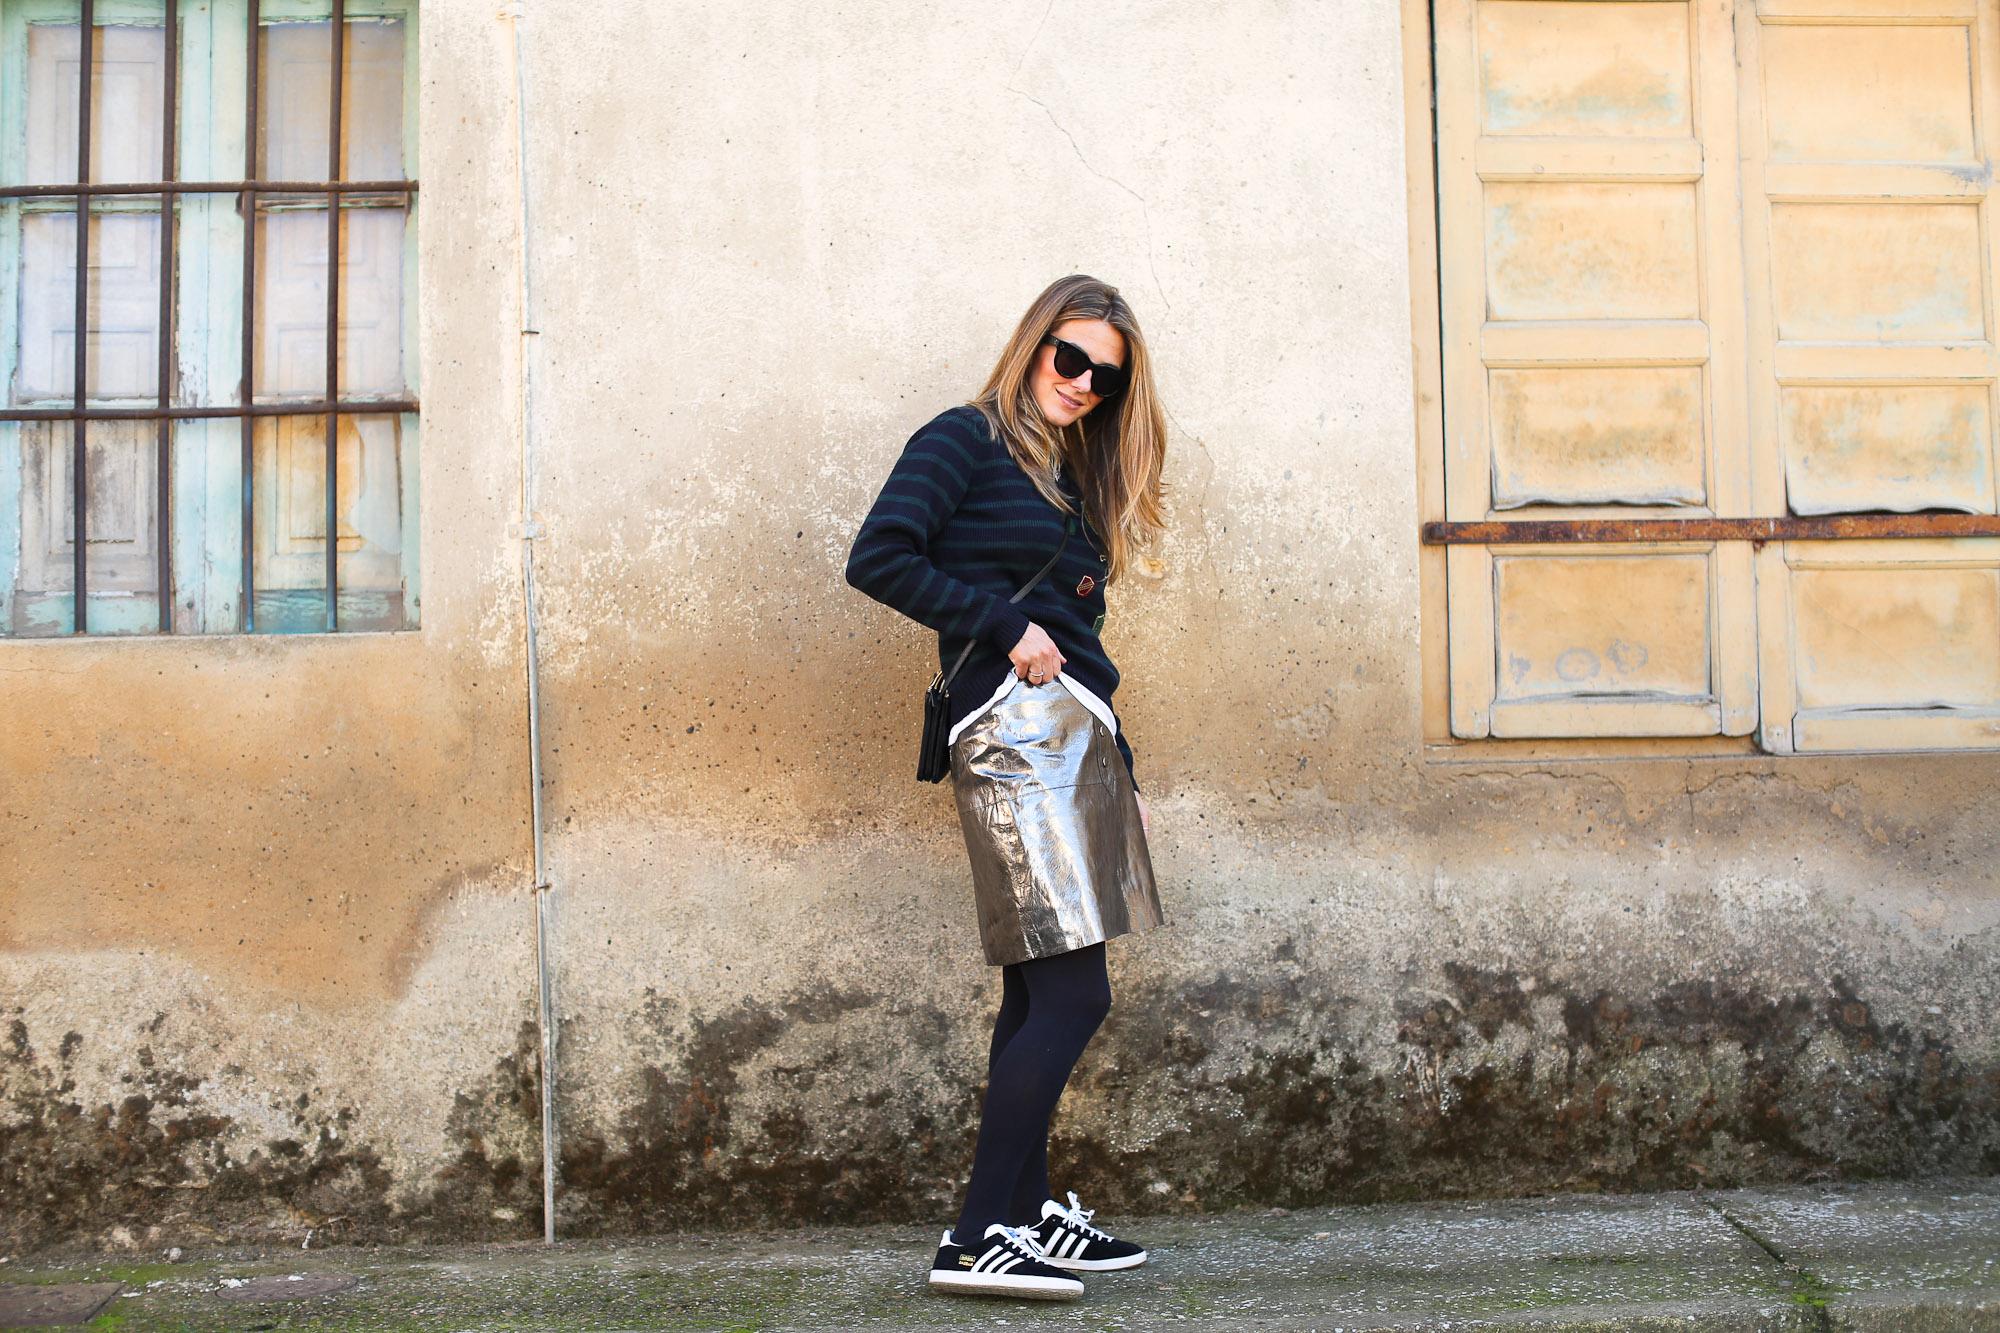 Clochet_streetstyle_fashionblogger_zarametallicleatherskirt_claudiepierlot_stripedknit_adidasgazelle-3